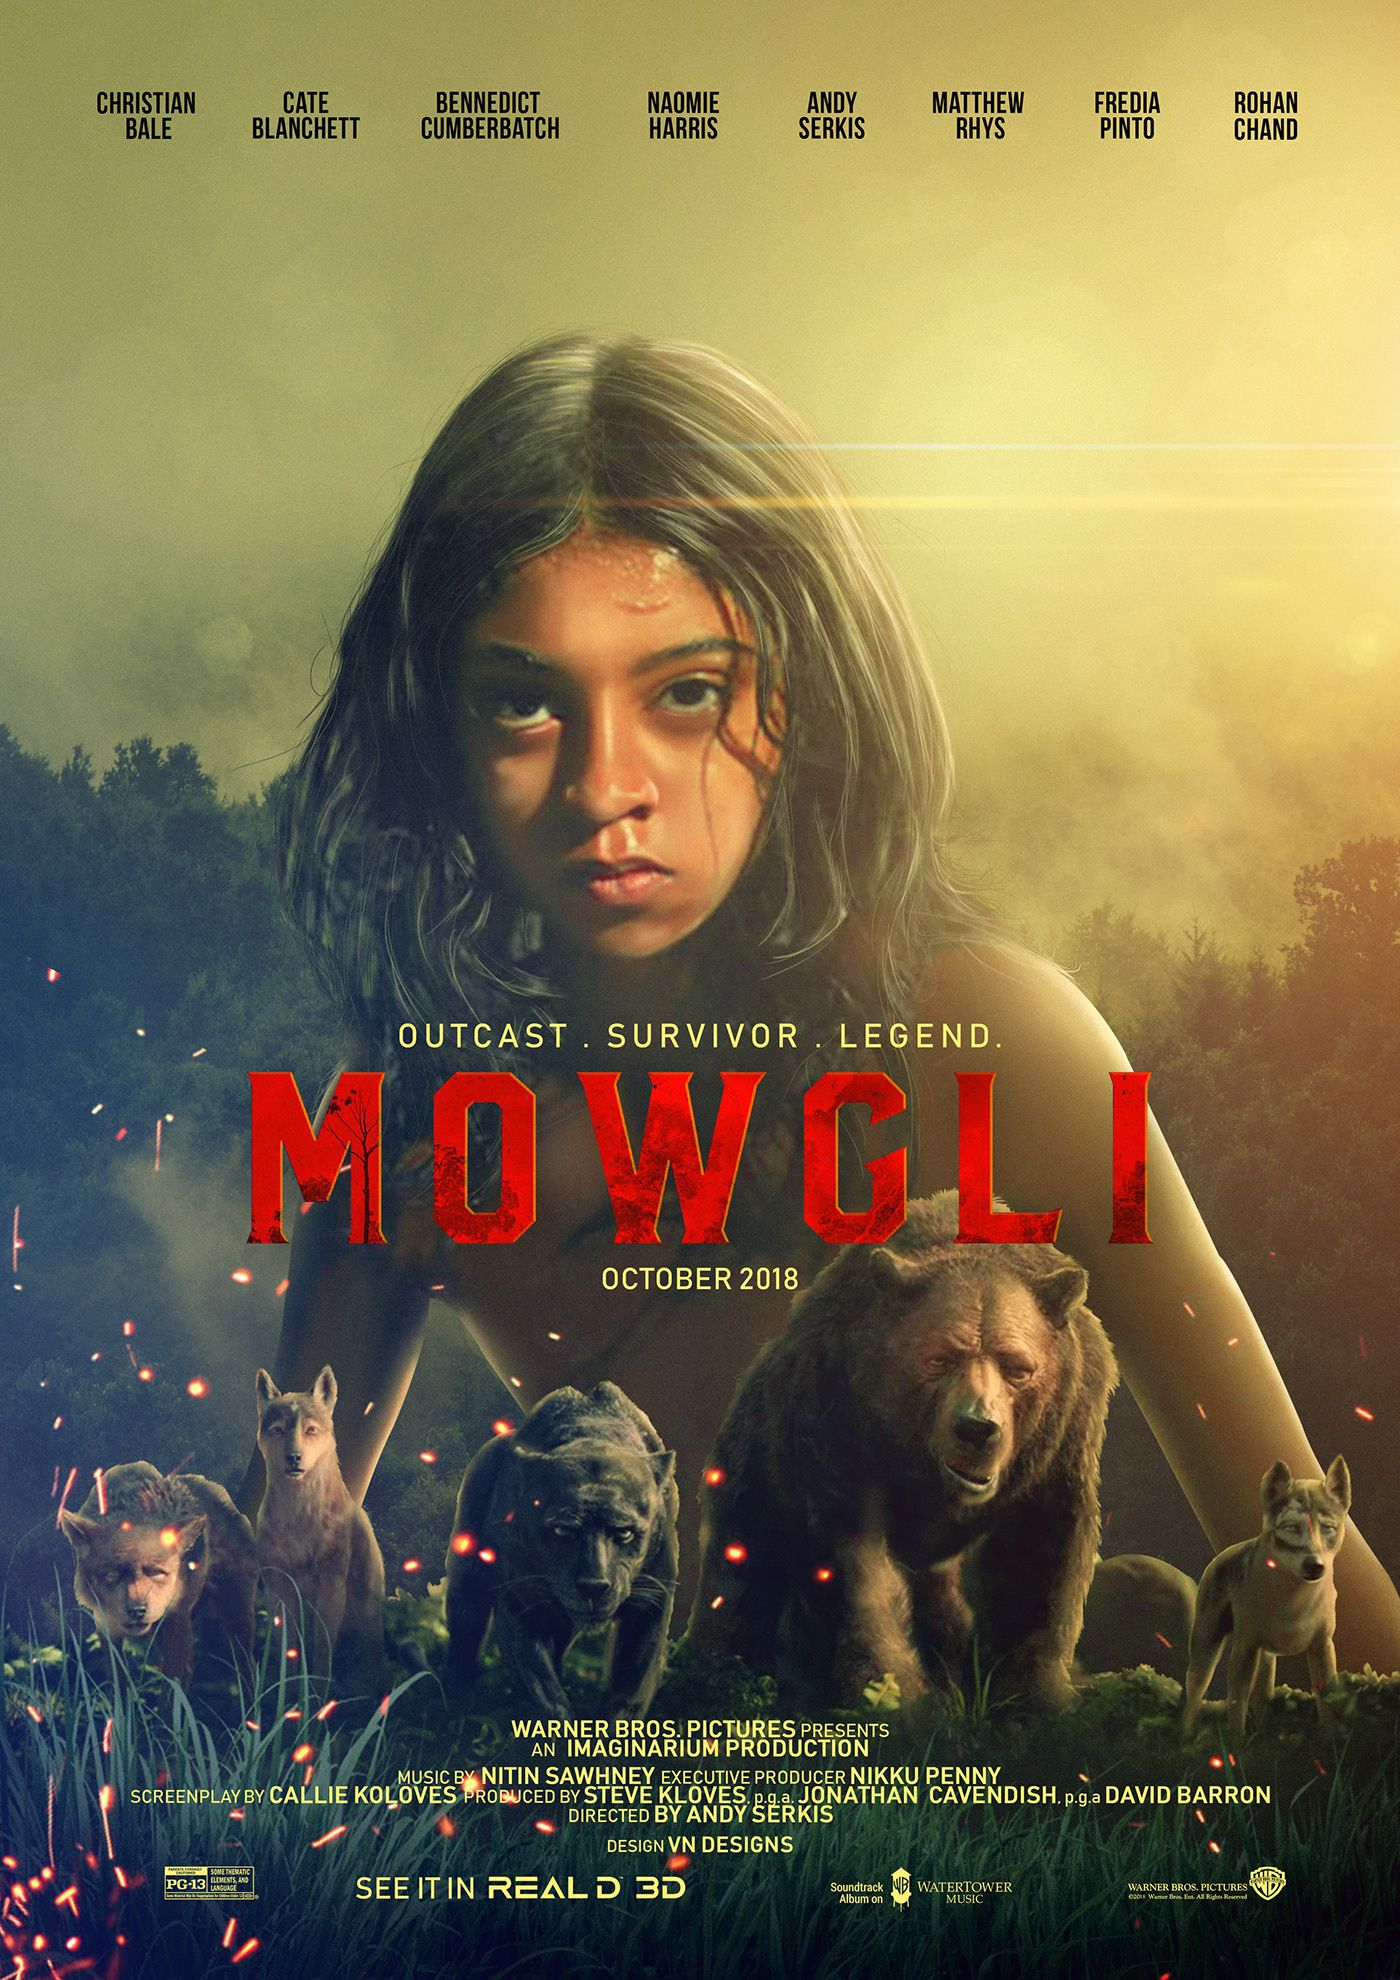 Mowgli 2018 Film Poster Design On Behance Film Poster Design Mowgli